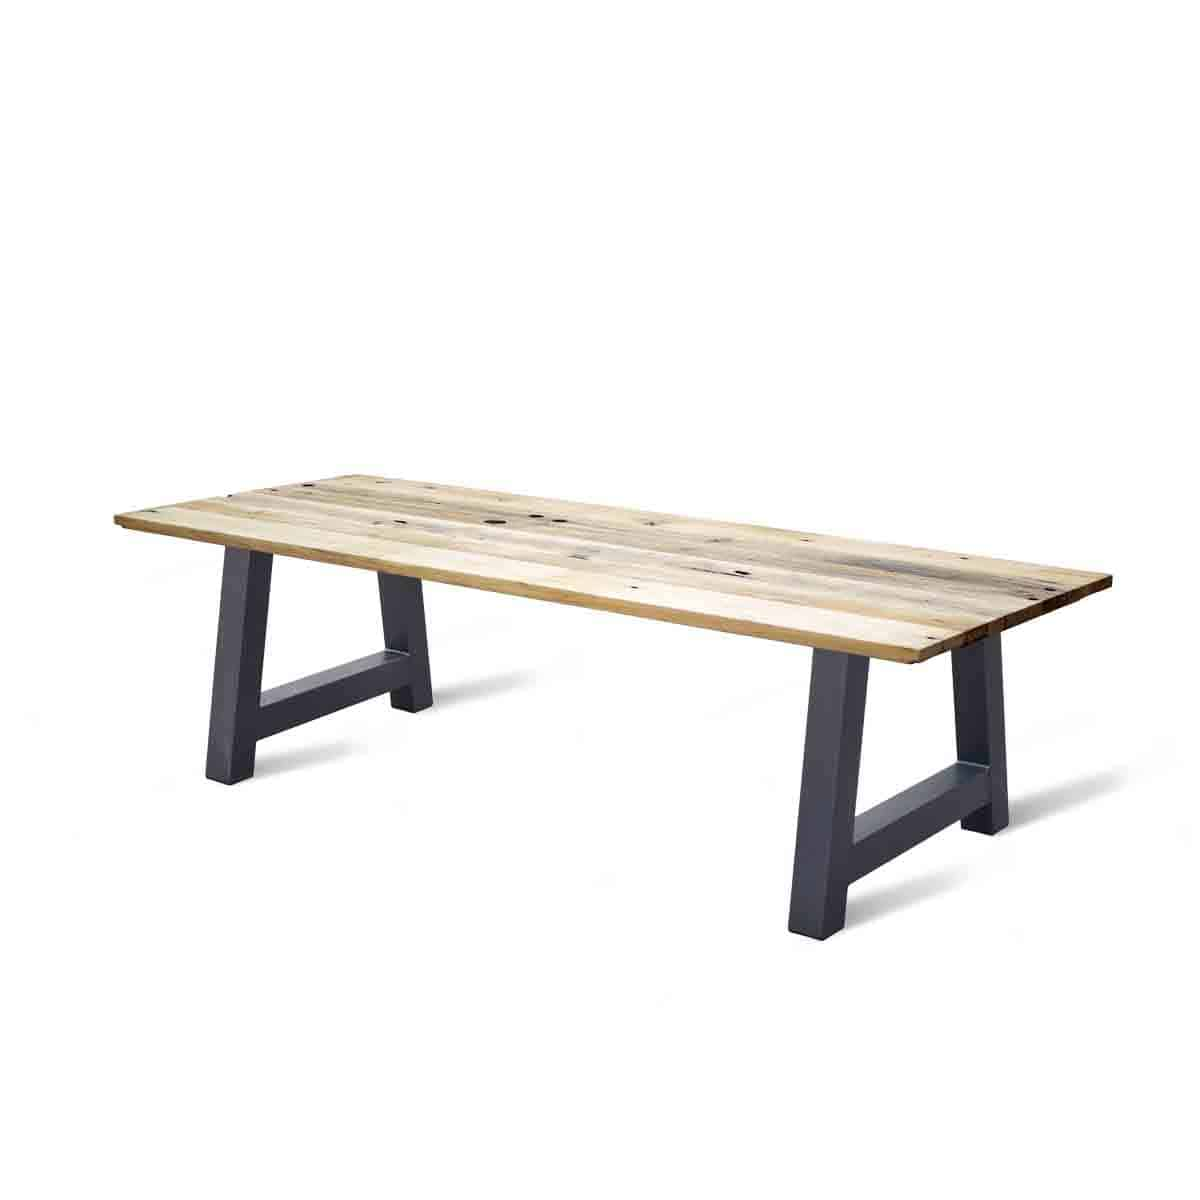 massief rechte eikenhouten wagonhout houten industrieel tafel eetkamer keuken meubelmaker friesland